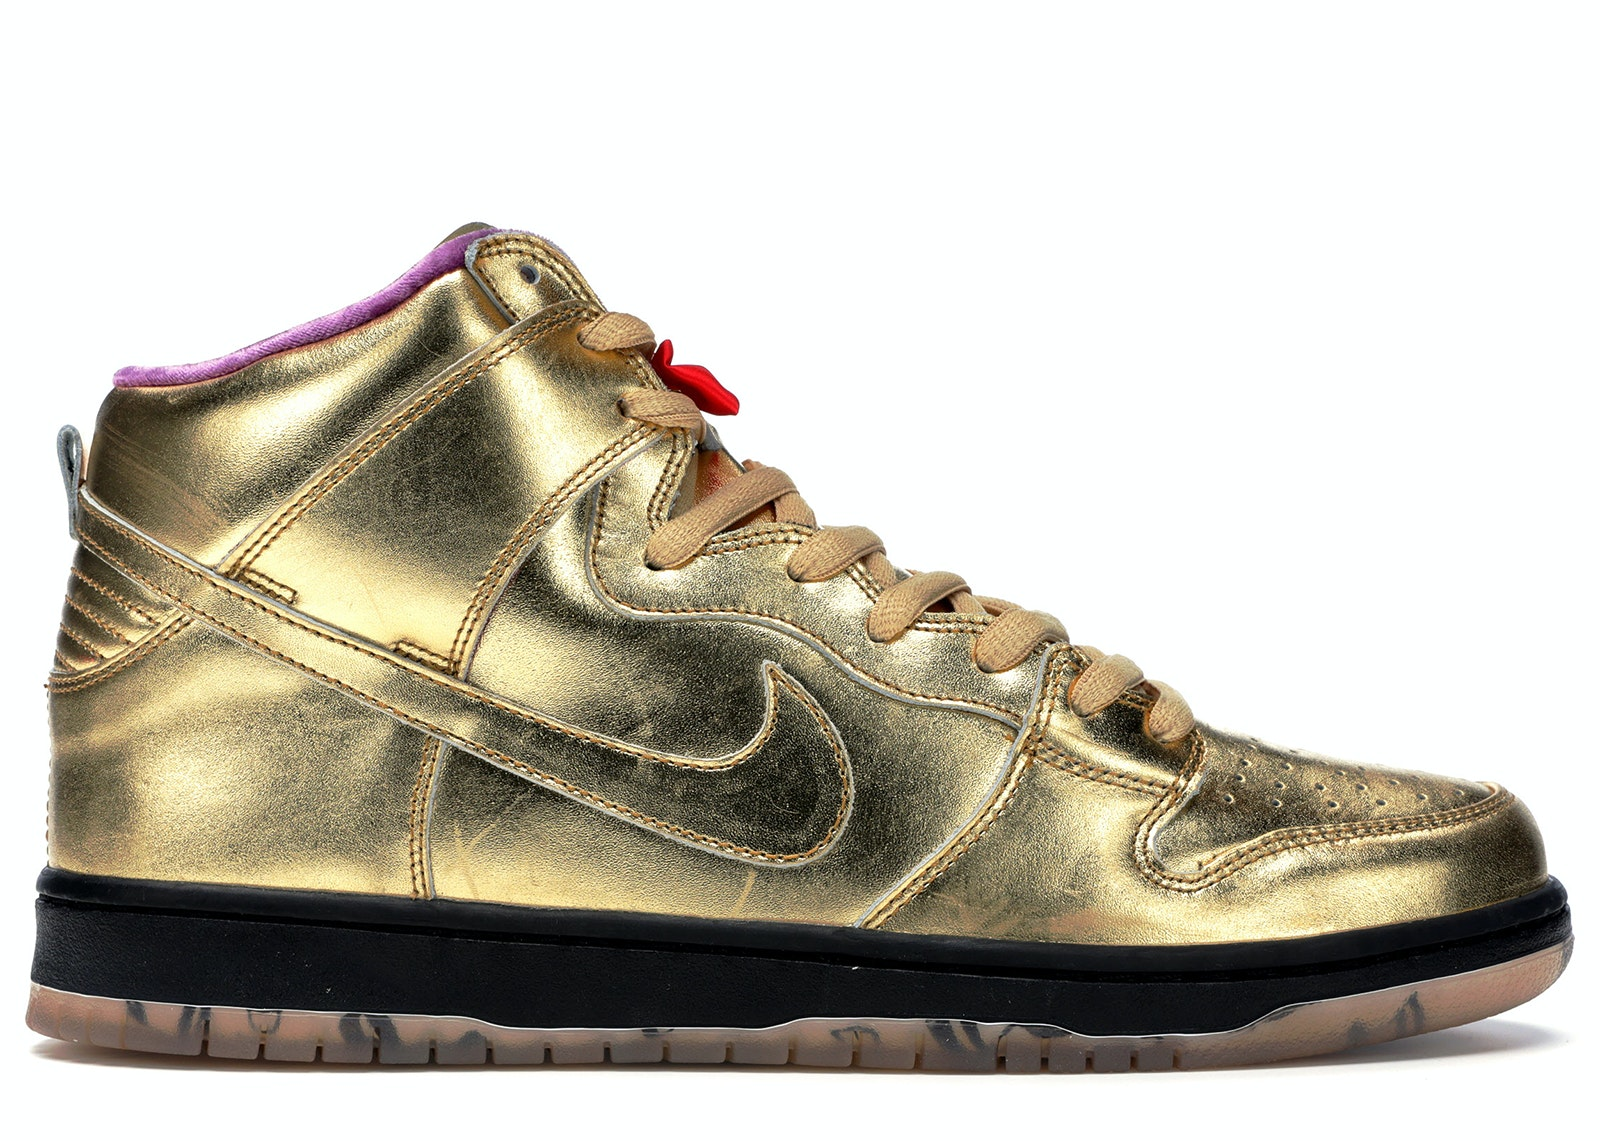 Nike SB Dunk High Humidity